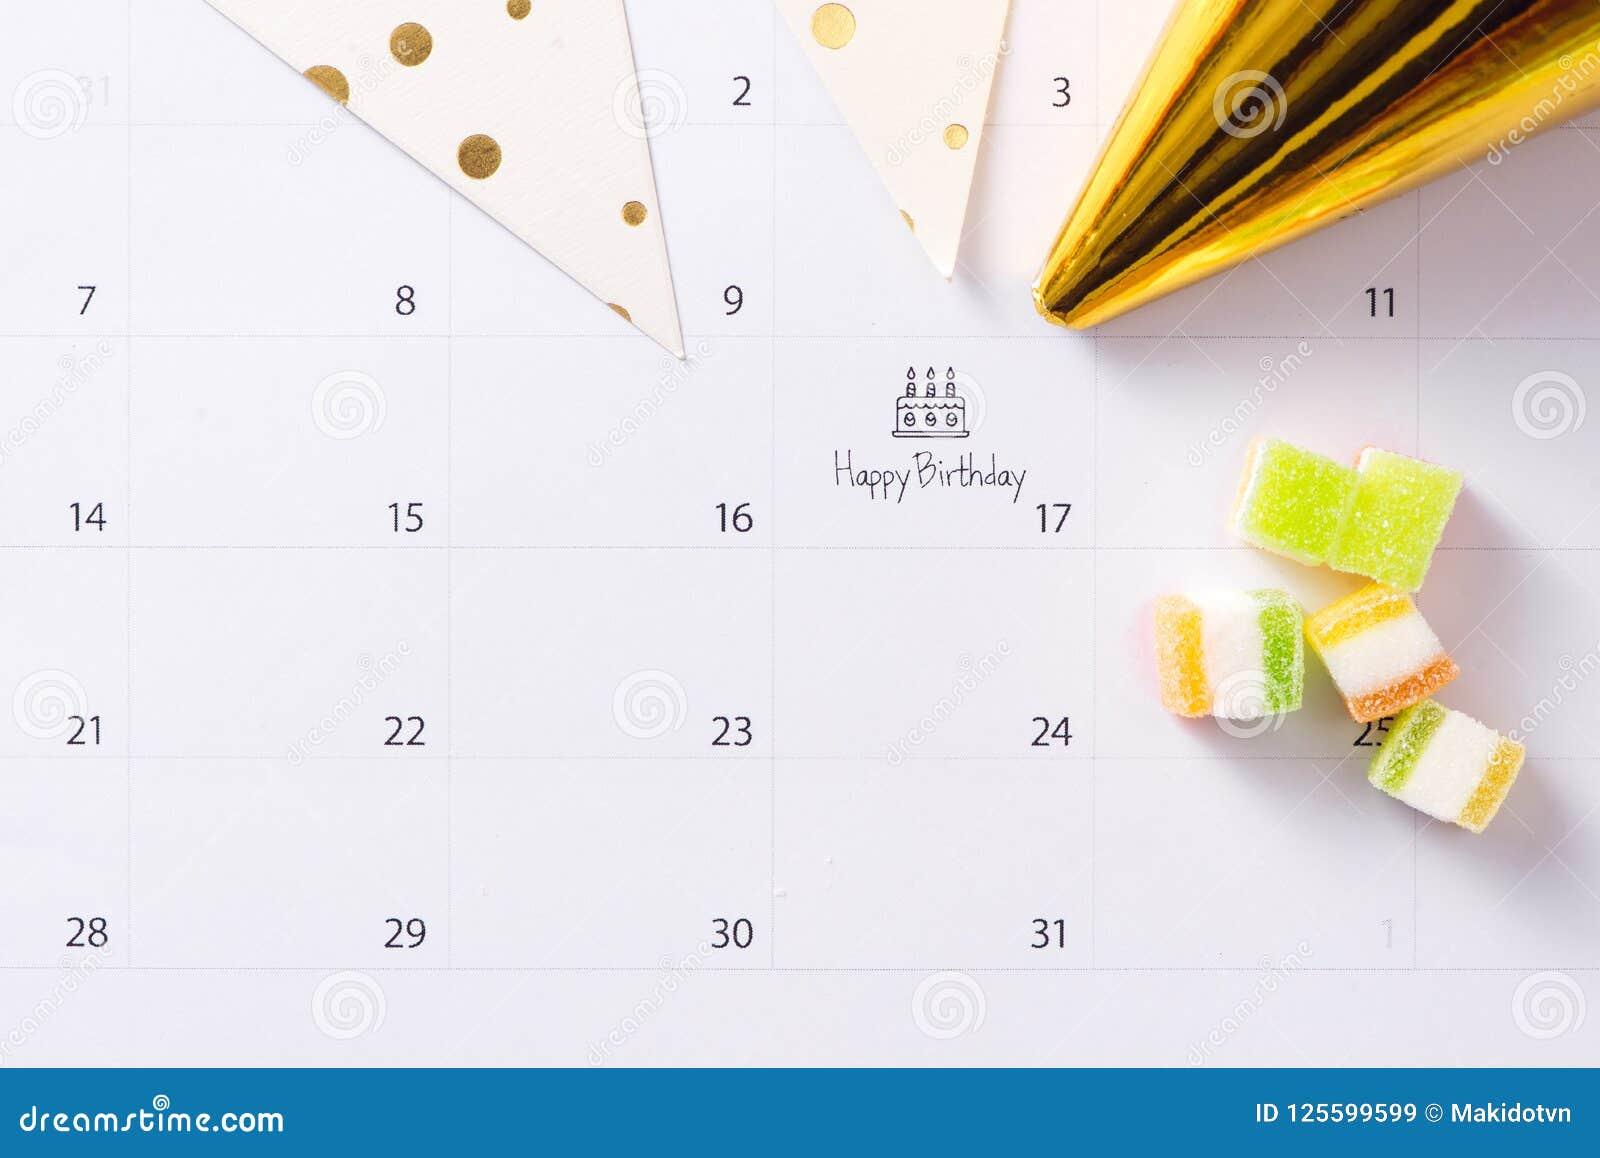 Writing Cake On Calendar Happy Birthday Stock Image Image Of Flat